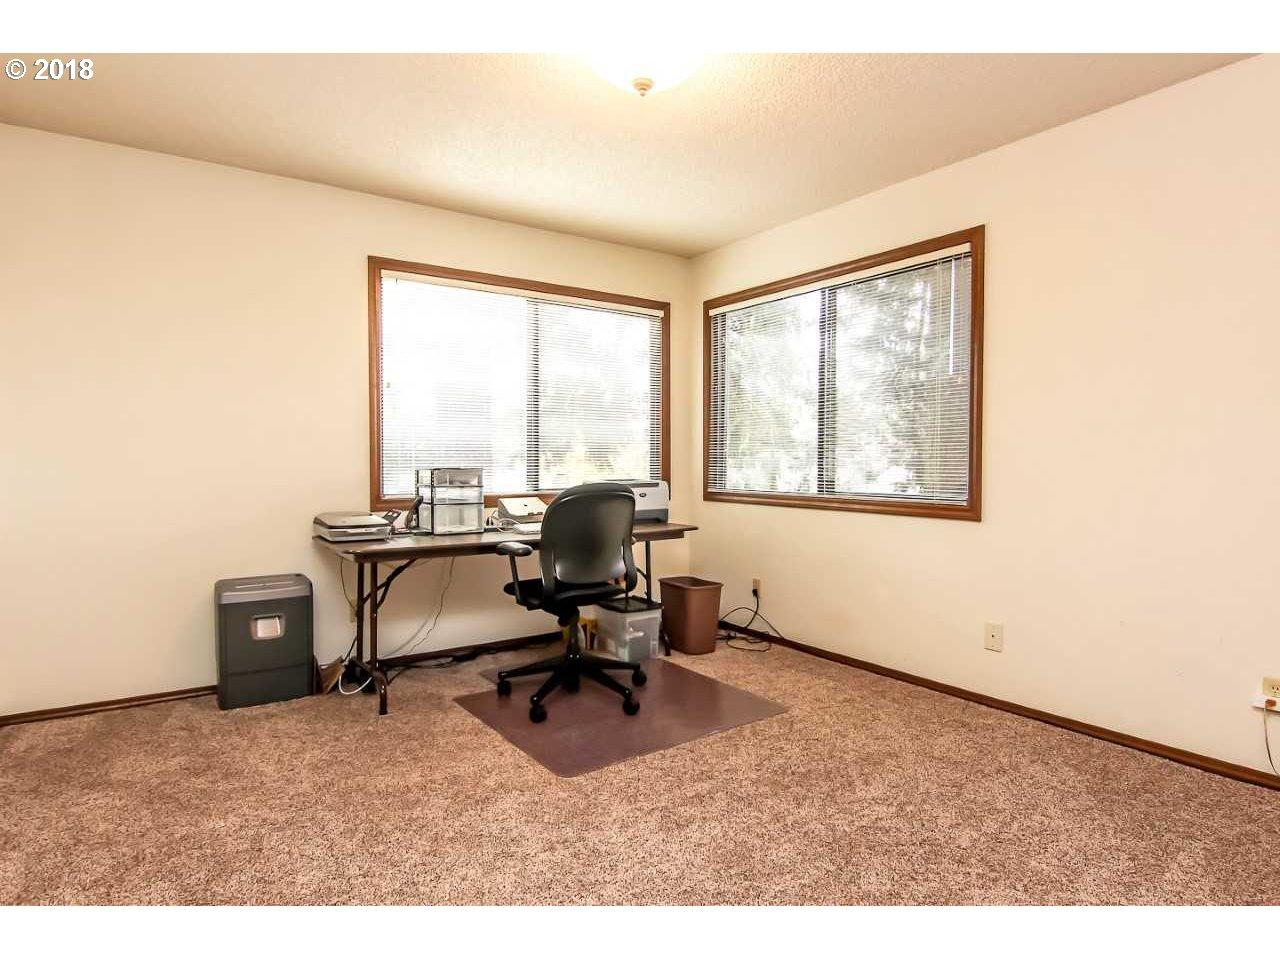 3905 NE 42nd ST Vancouver, WA 98661 - MLS #: 18573170